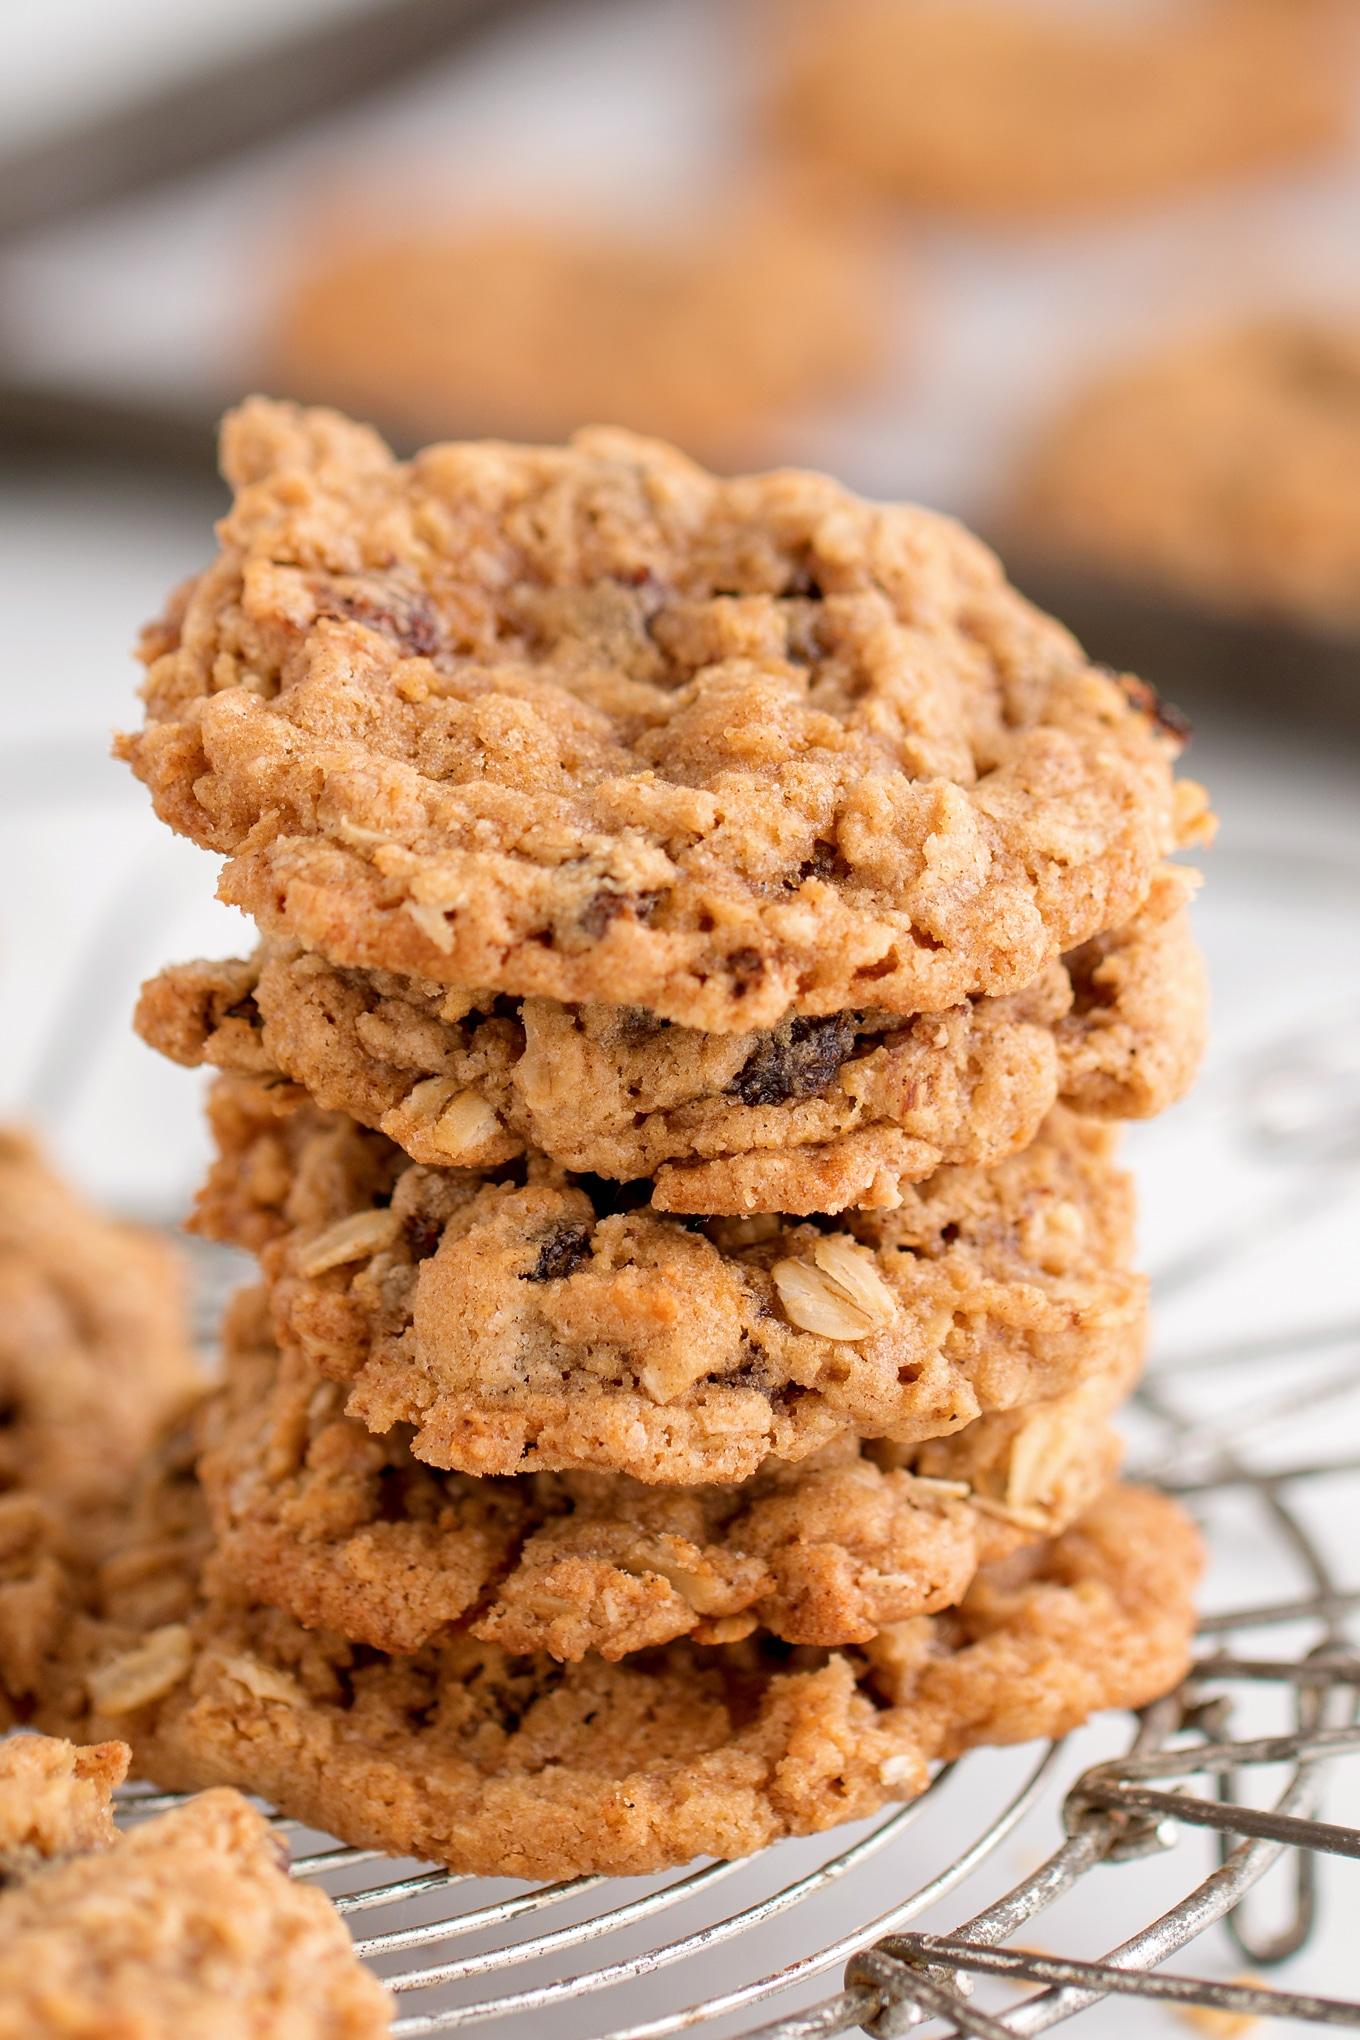 Stack of Freshly Baked Oatmeal Raisin Cookies